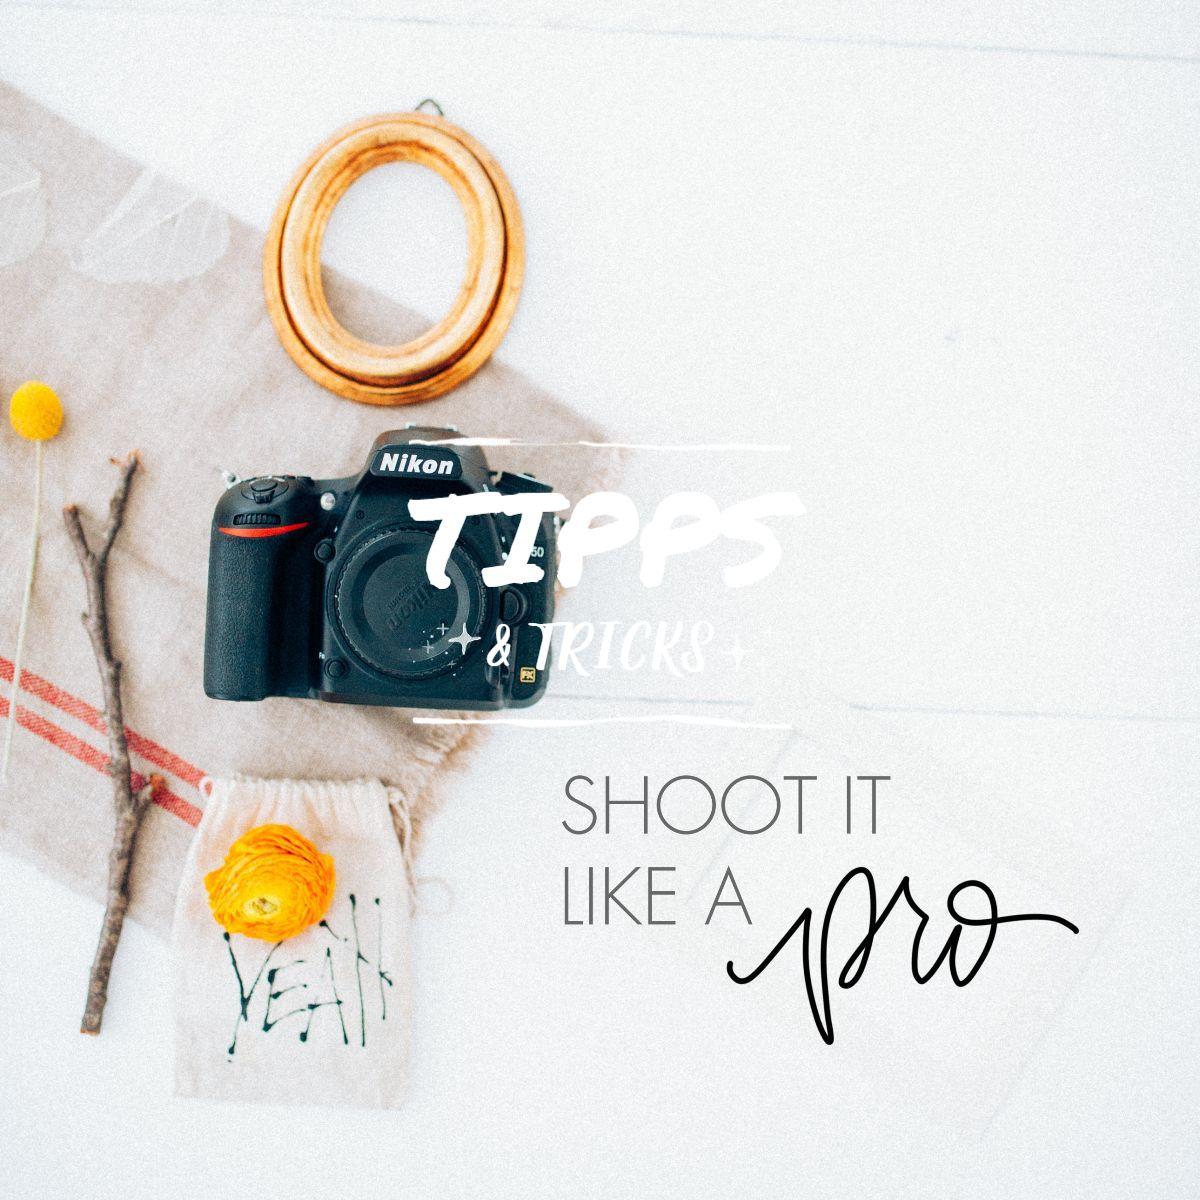 fotografie-workshop-muenchen-silap